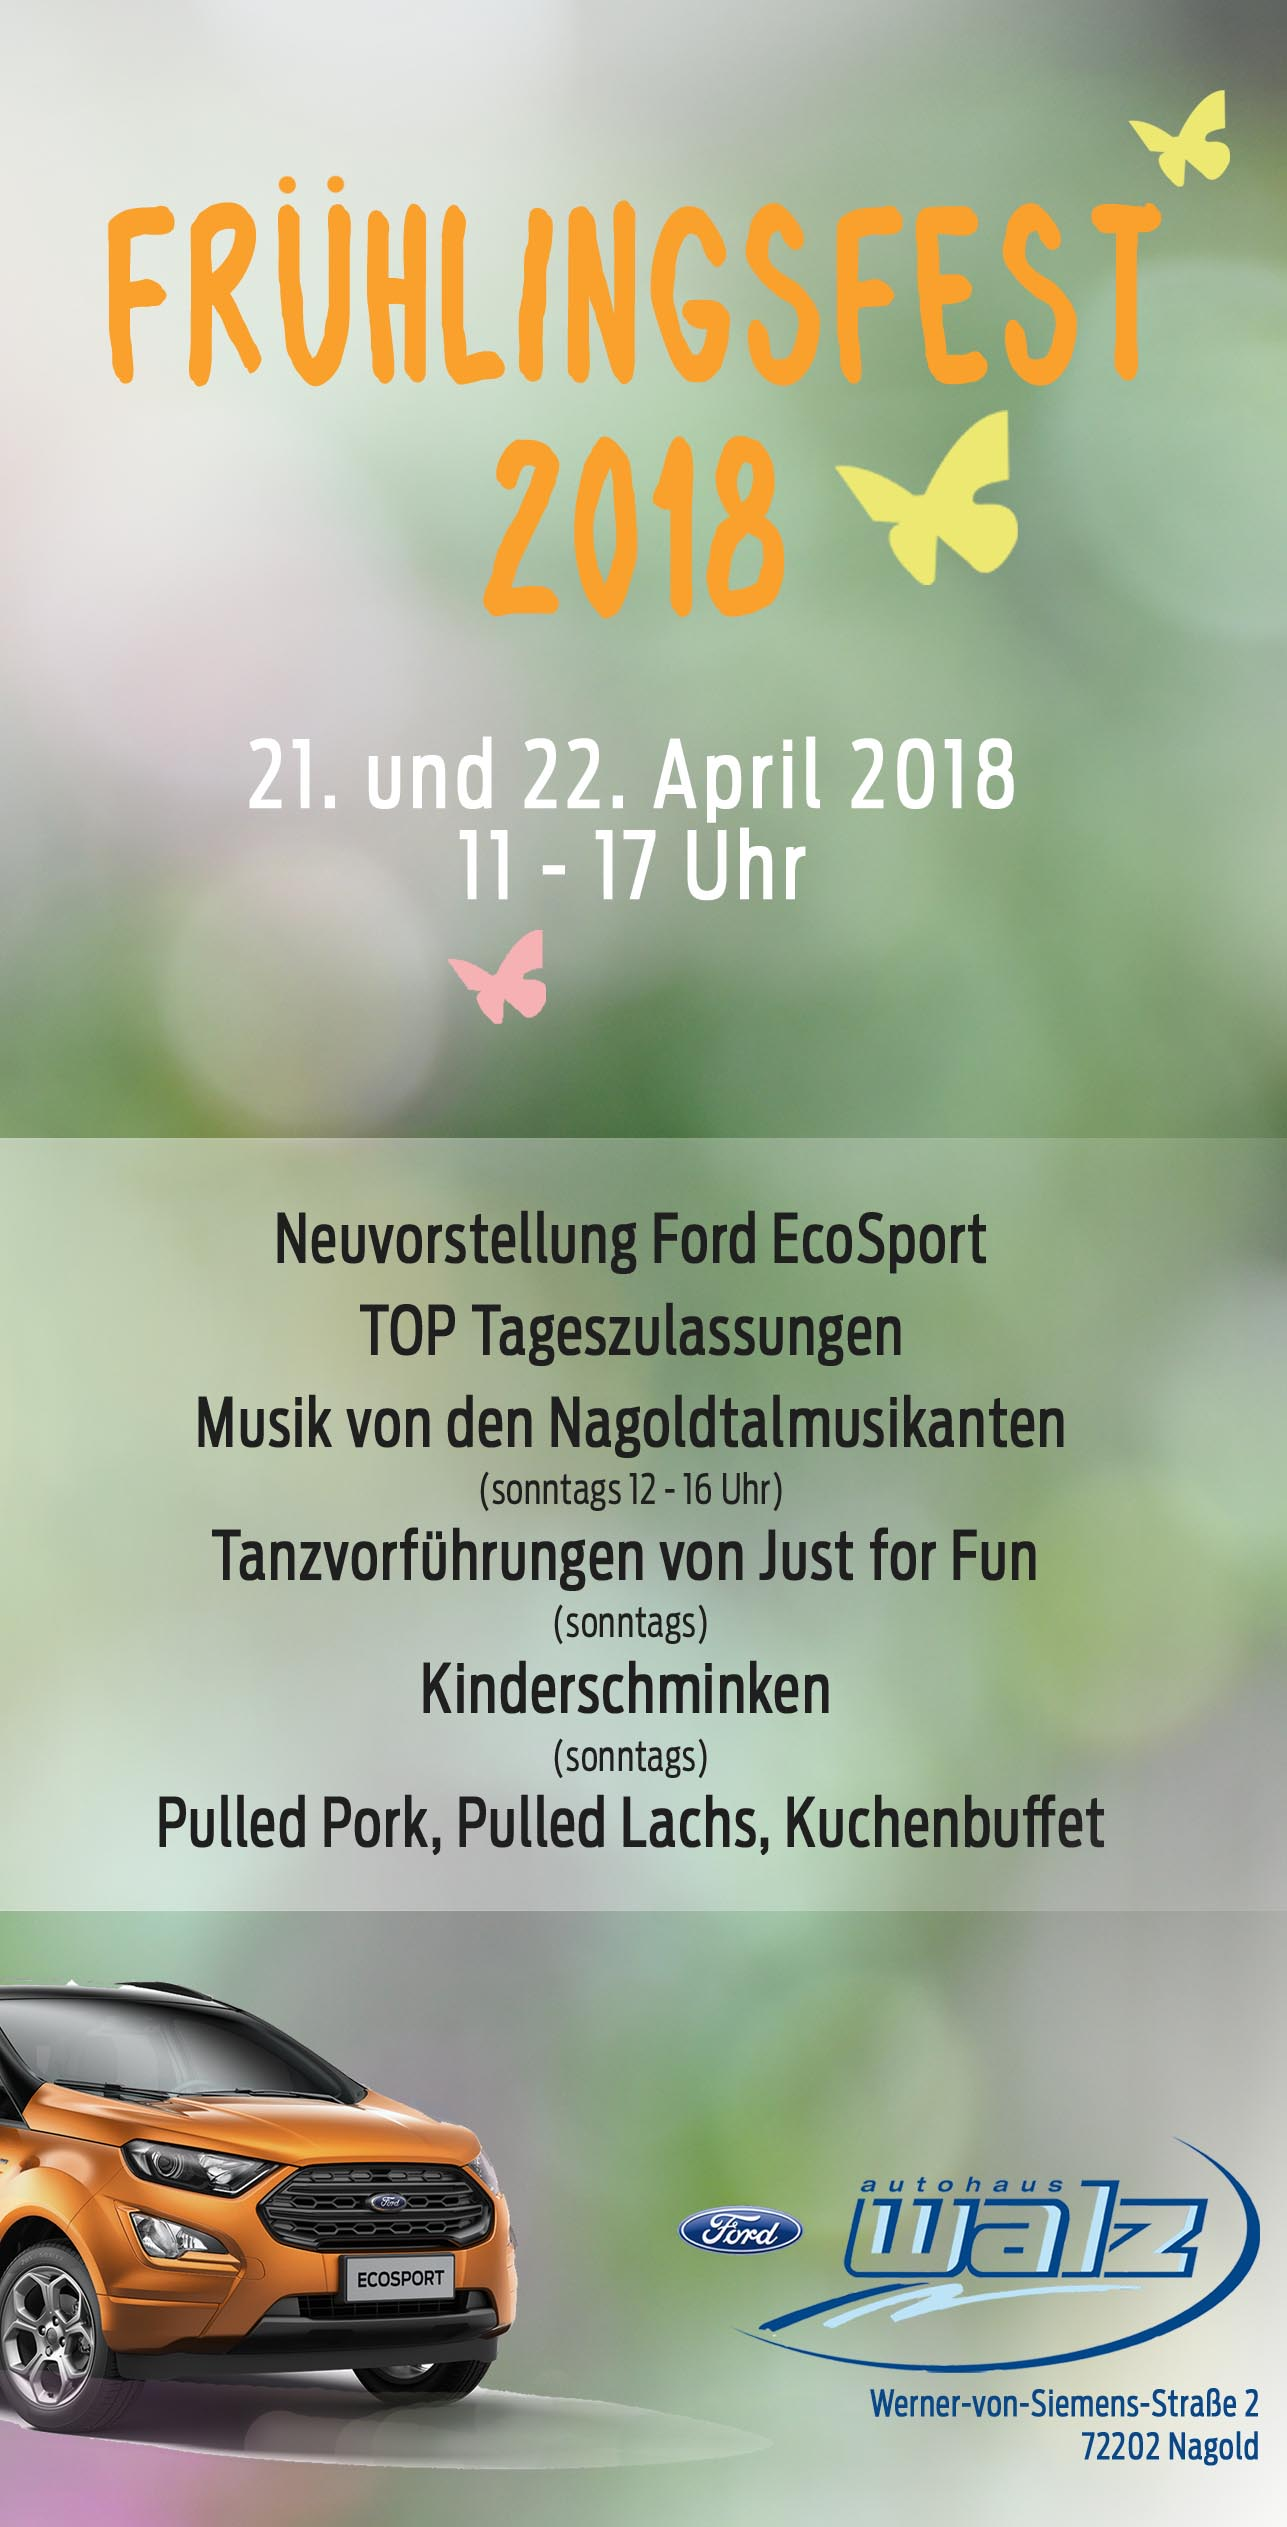 Frühlingsfest Autohaus Walz Nagold 2018